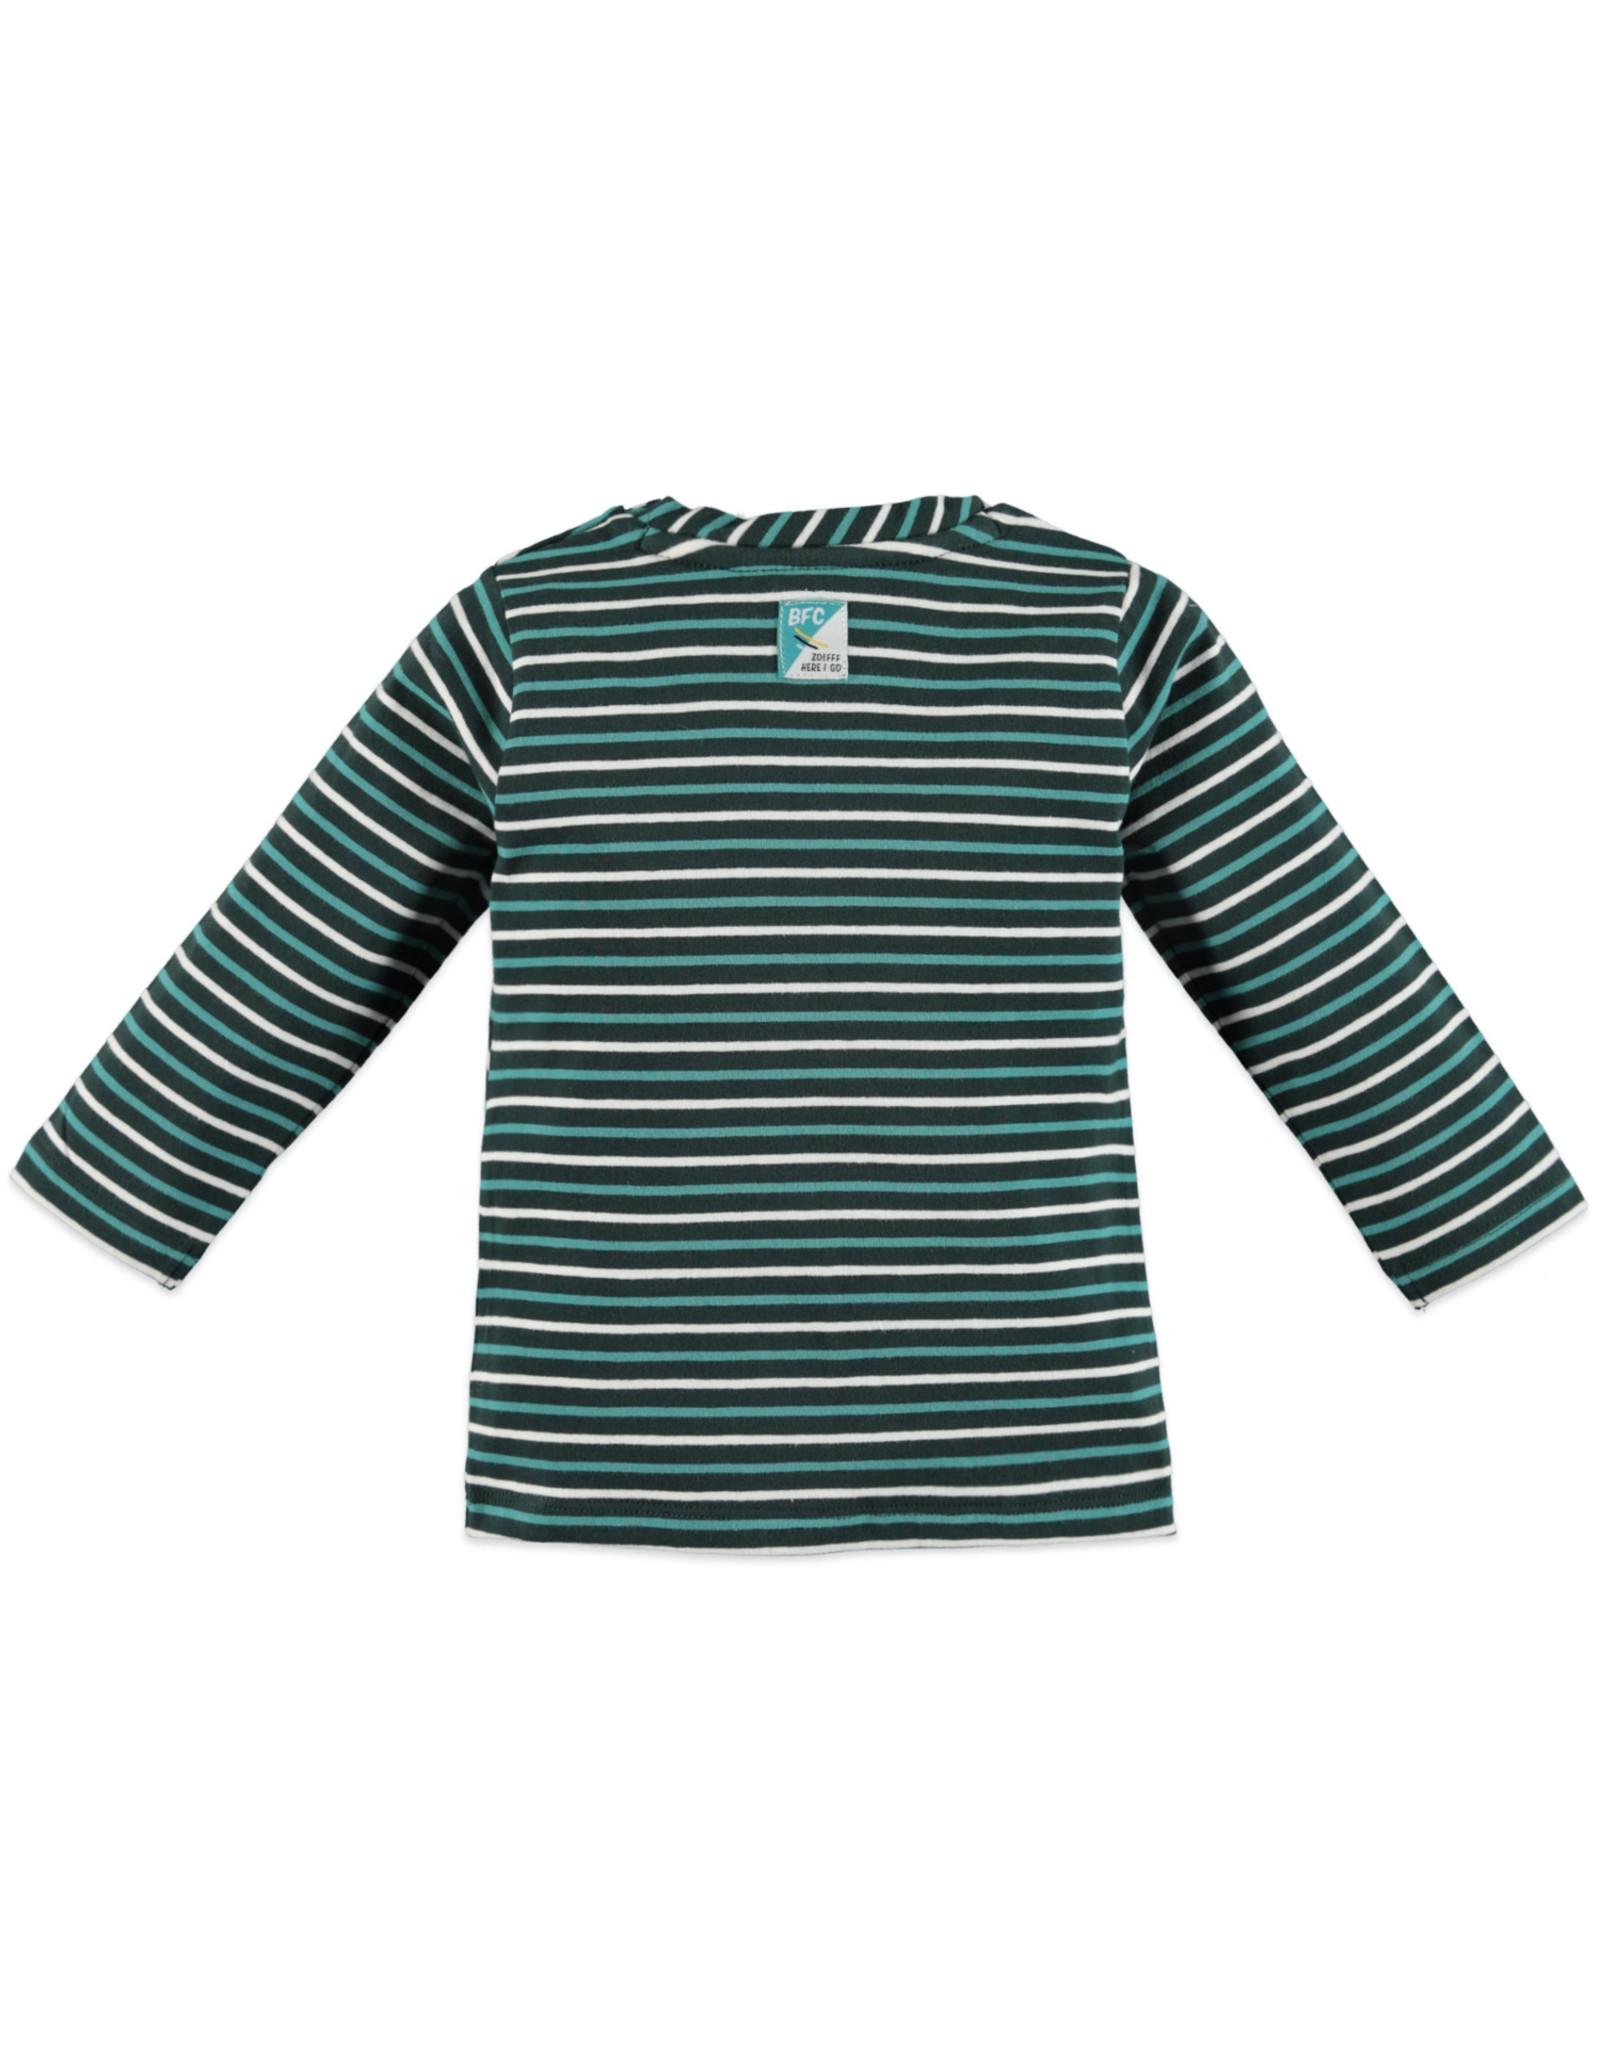 Babyface boys t-shirt long sleeve/bottle